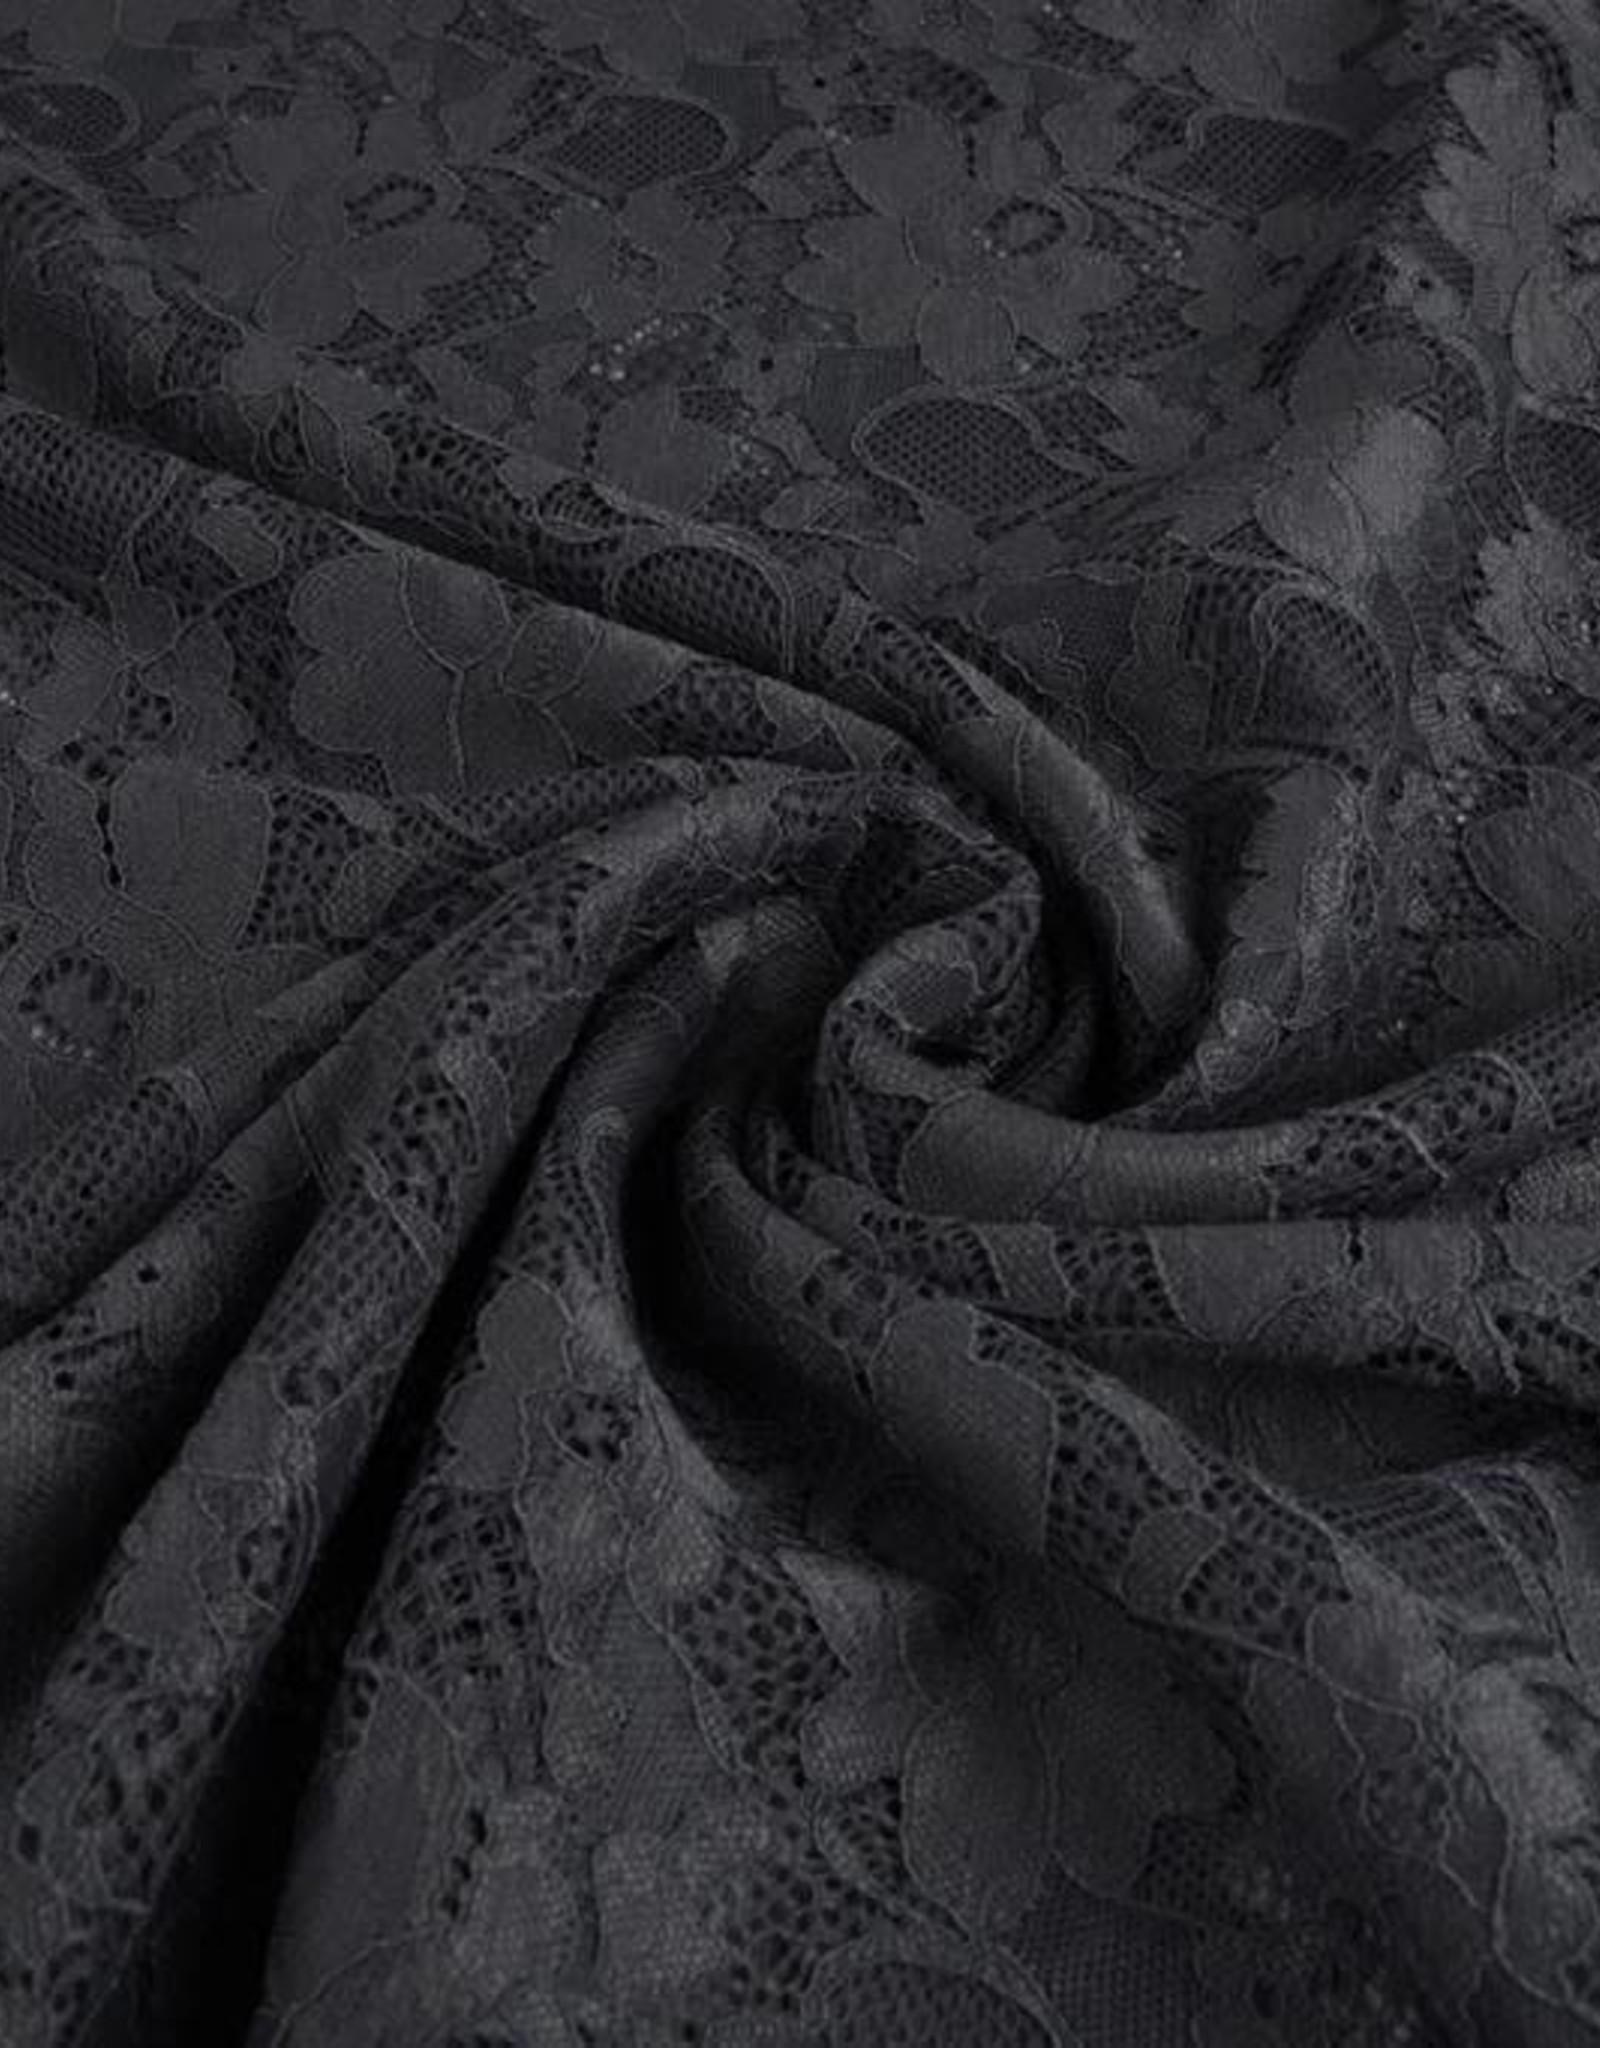 Kant bloemen donker grijs